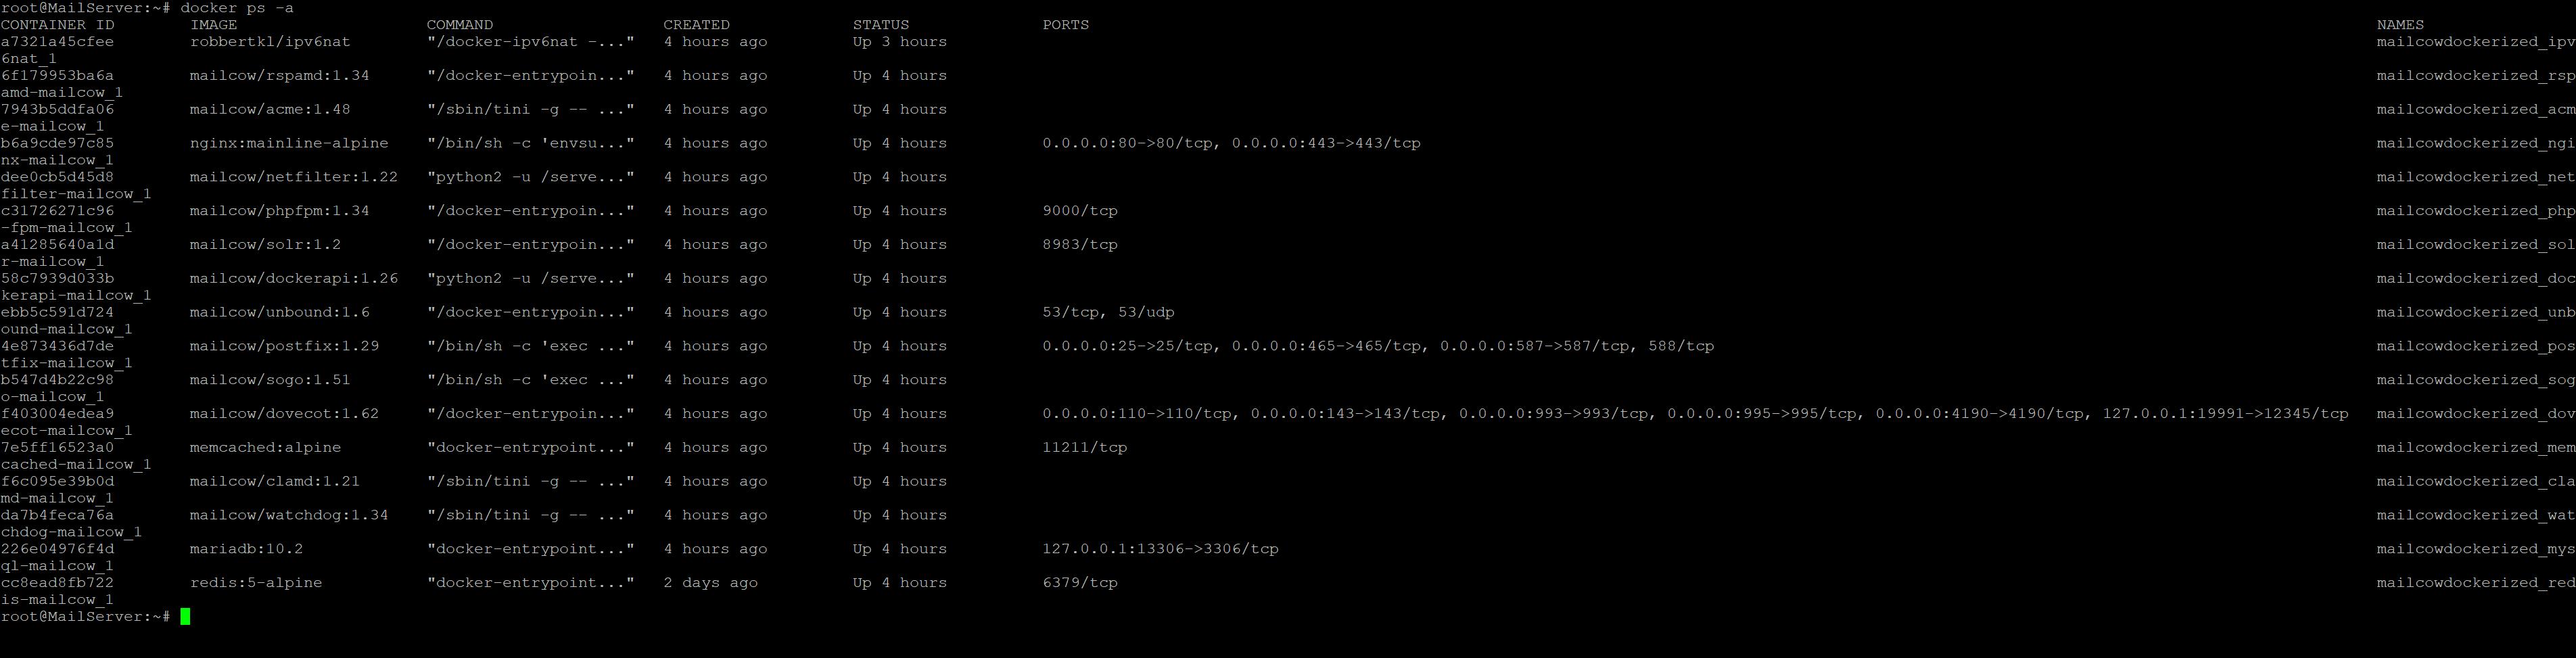 Web interface keeps crashing · Issue #2332 · mailcow/mailcow